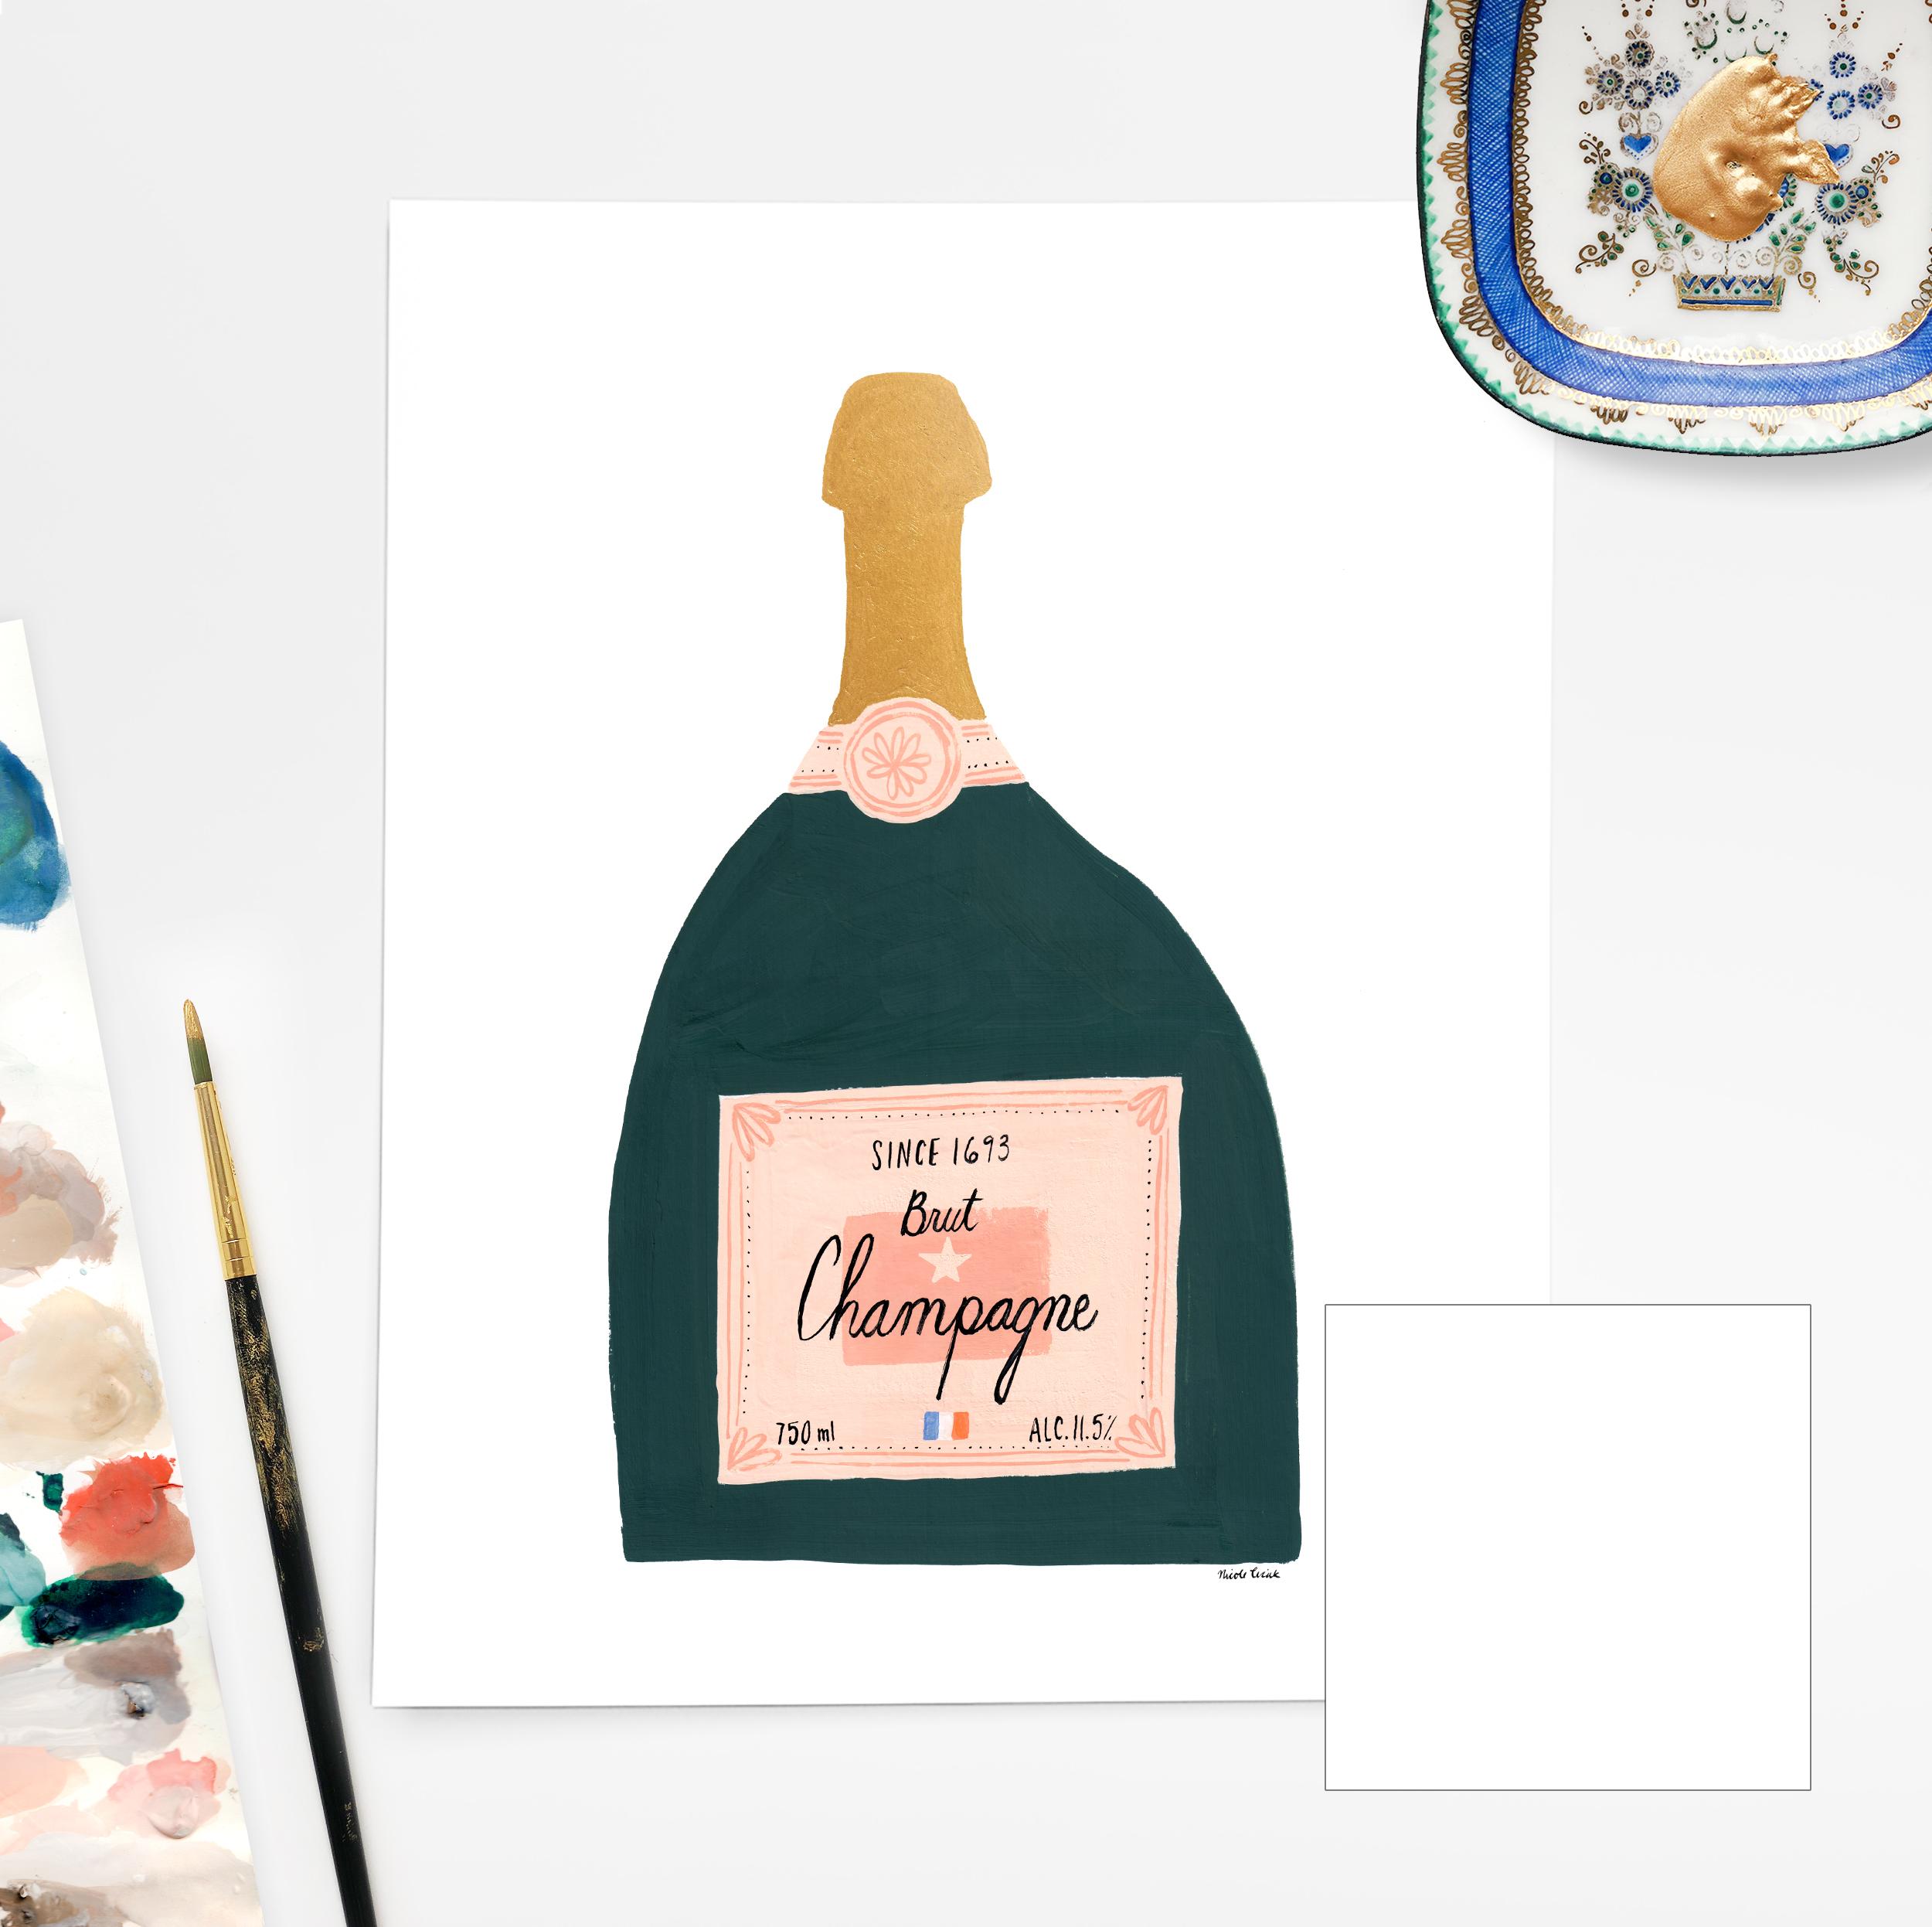 Champagne_Swatch.jpg